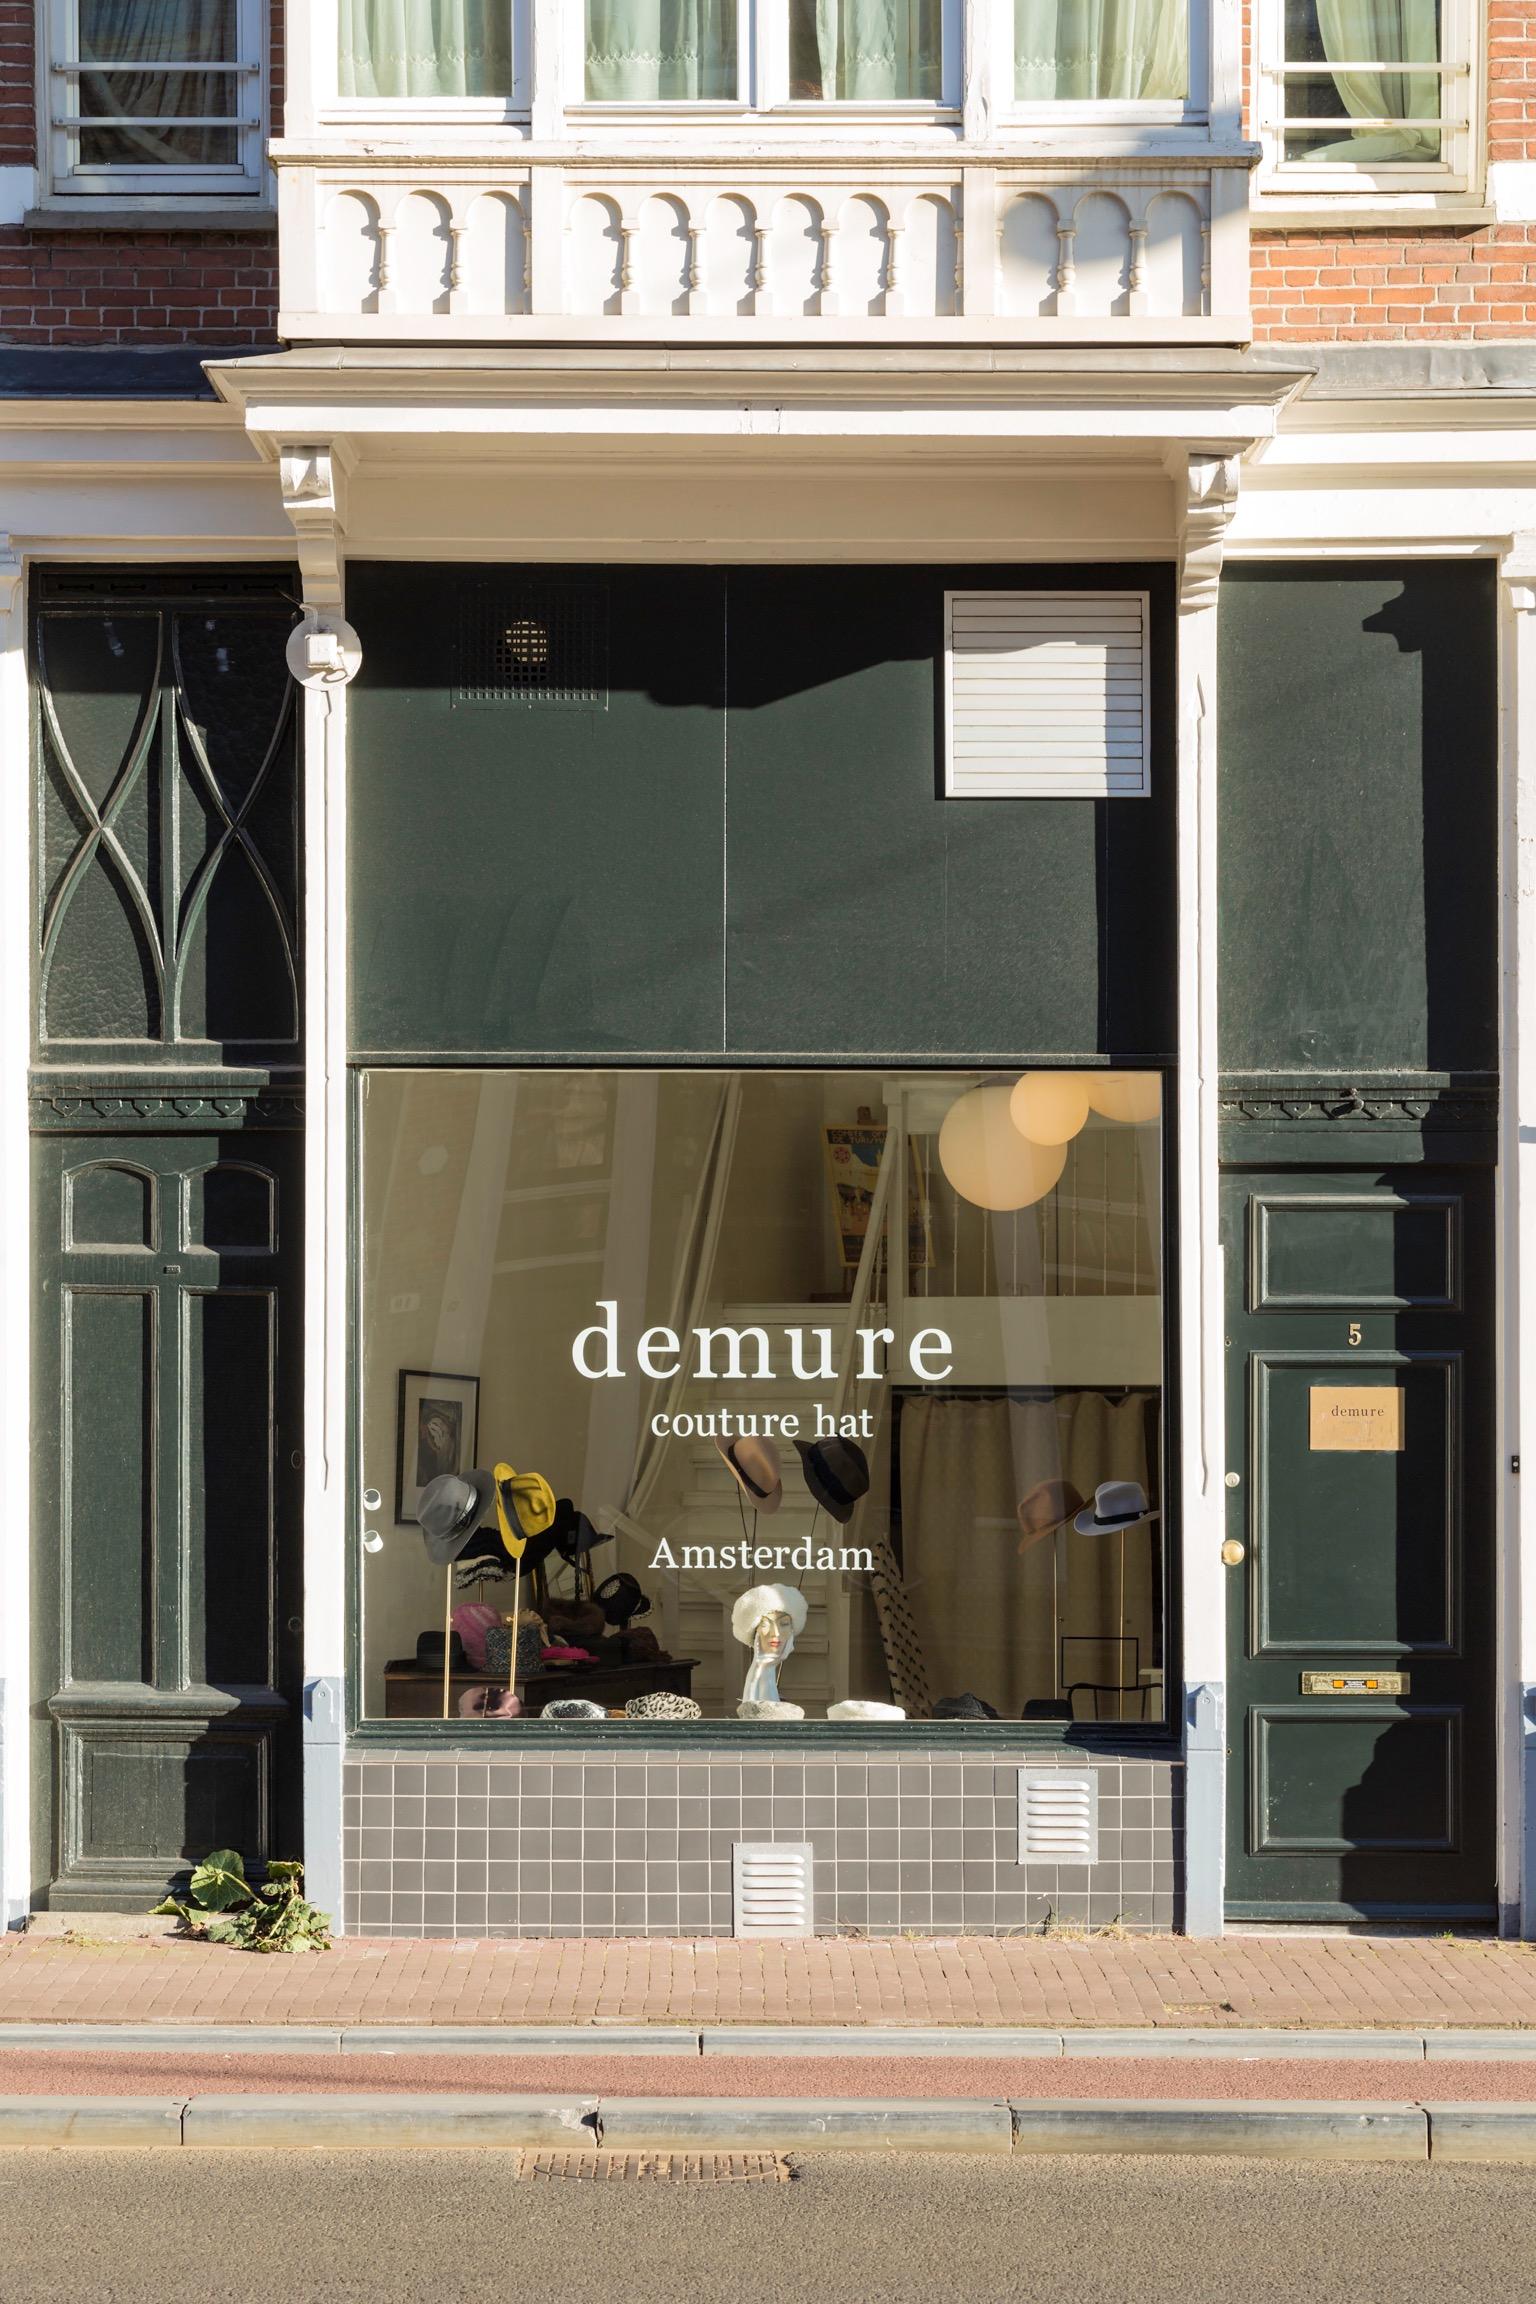 demure studio shop, Korte Marnixstraat 5, 1013 HT Amsterdam